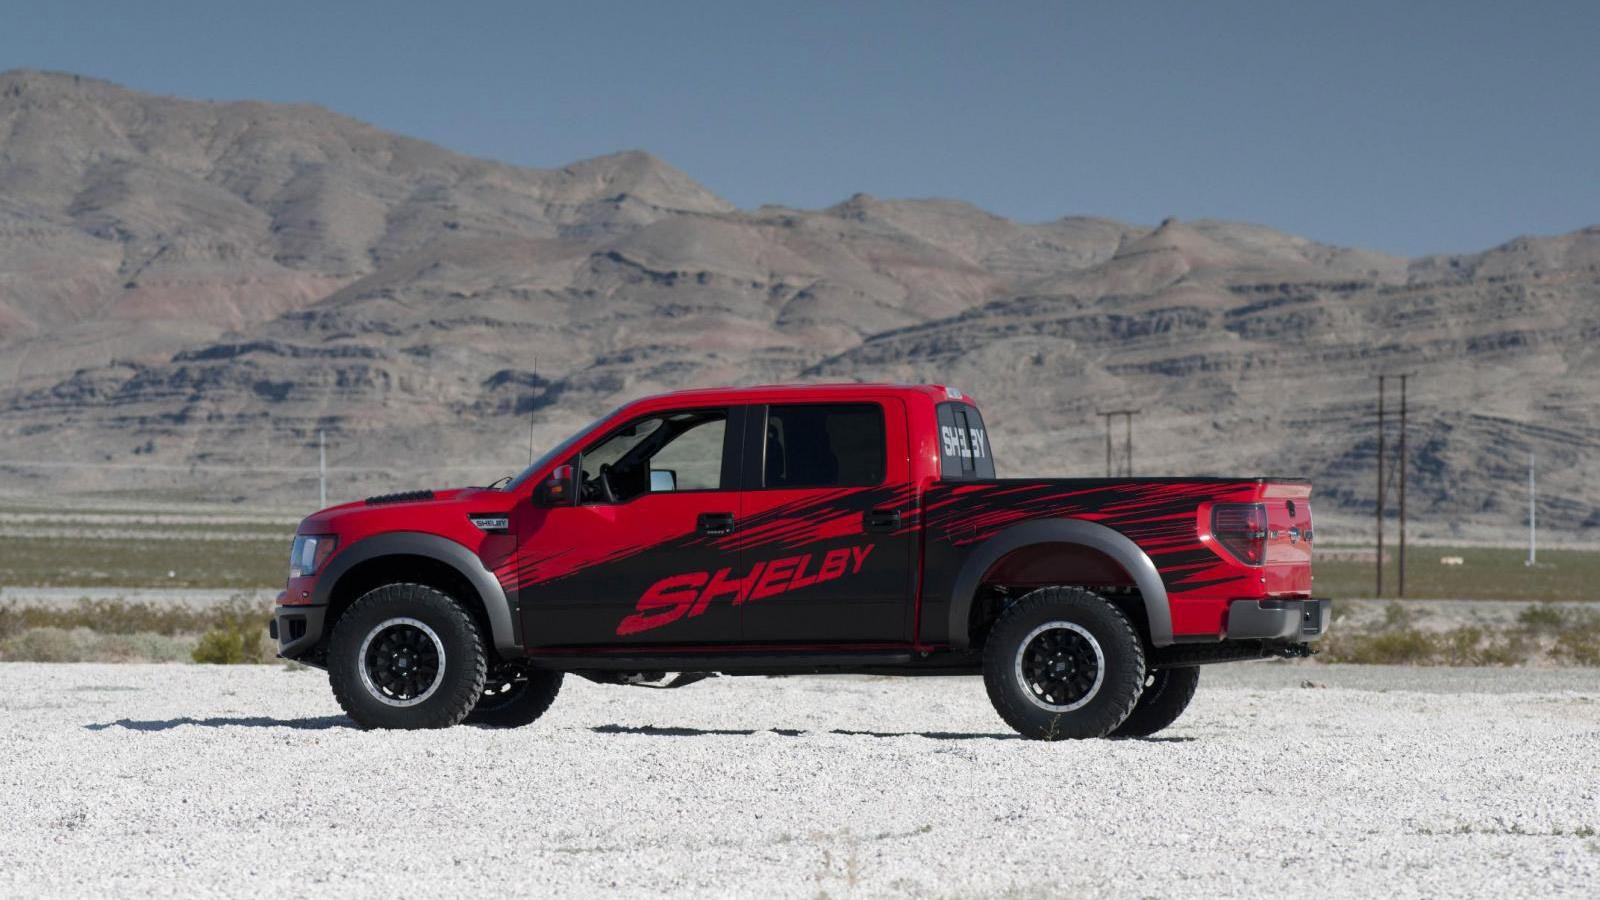 2013 Shelby Raptor